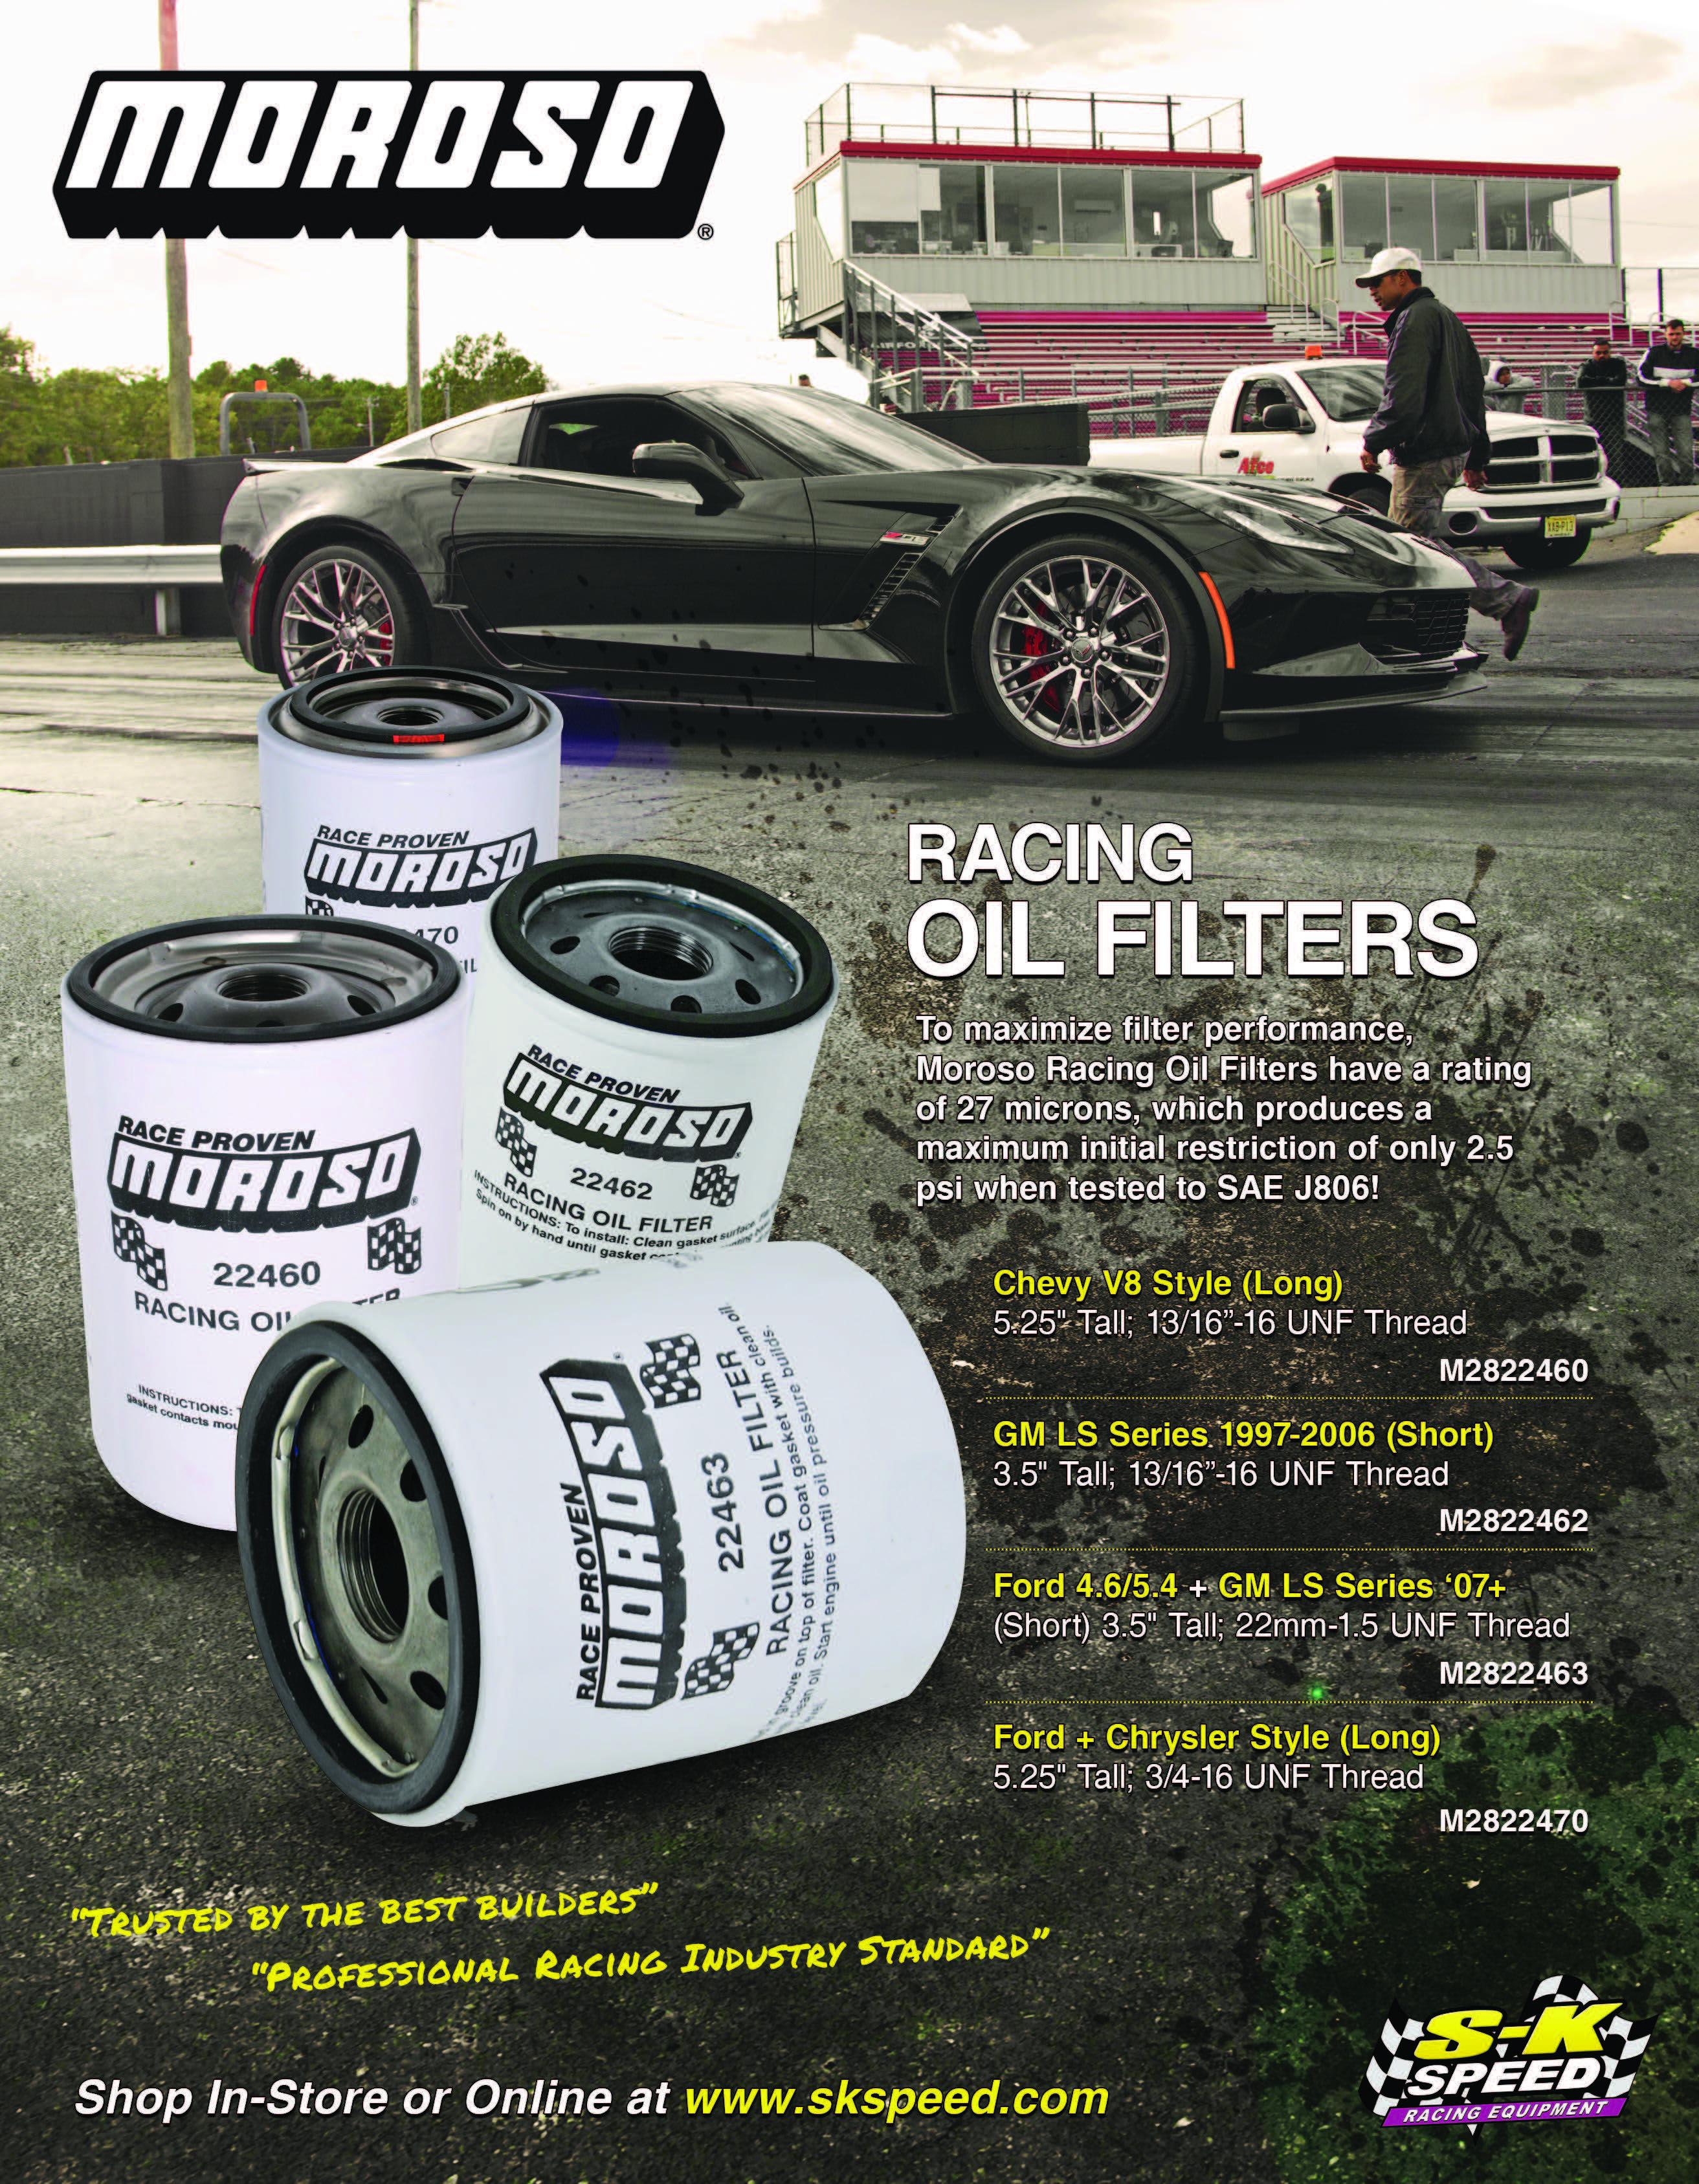 moroso-oil-filters-2018.jpg